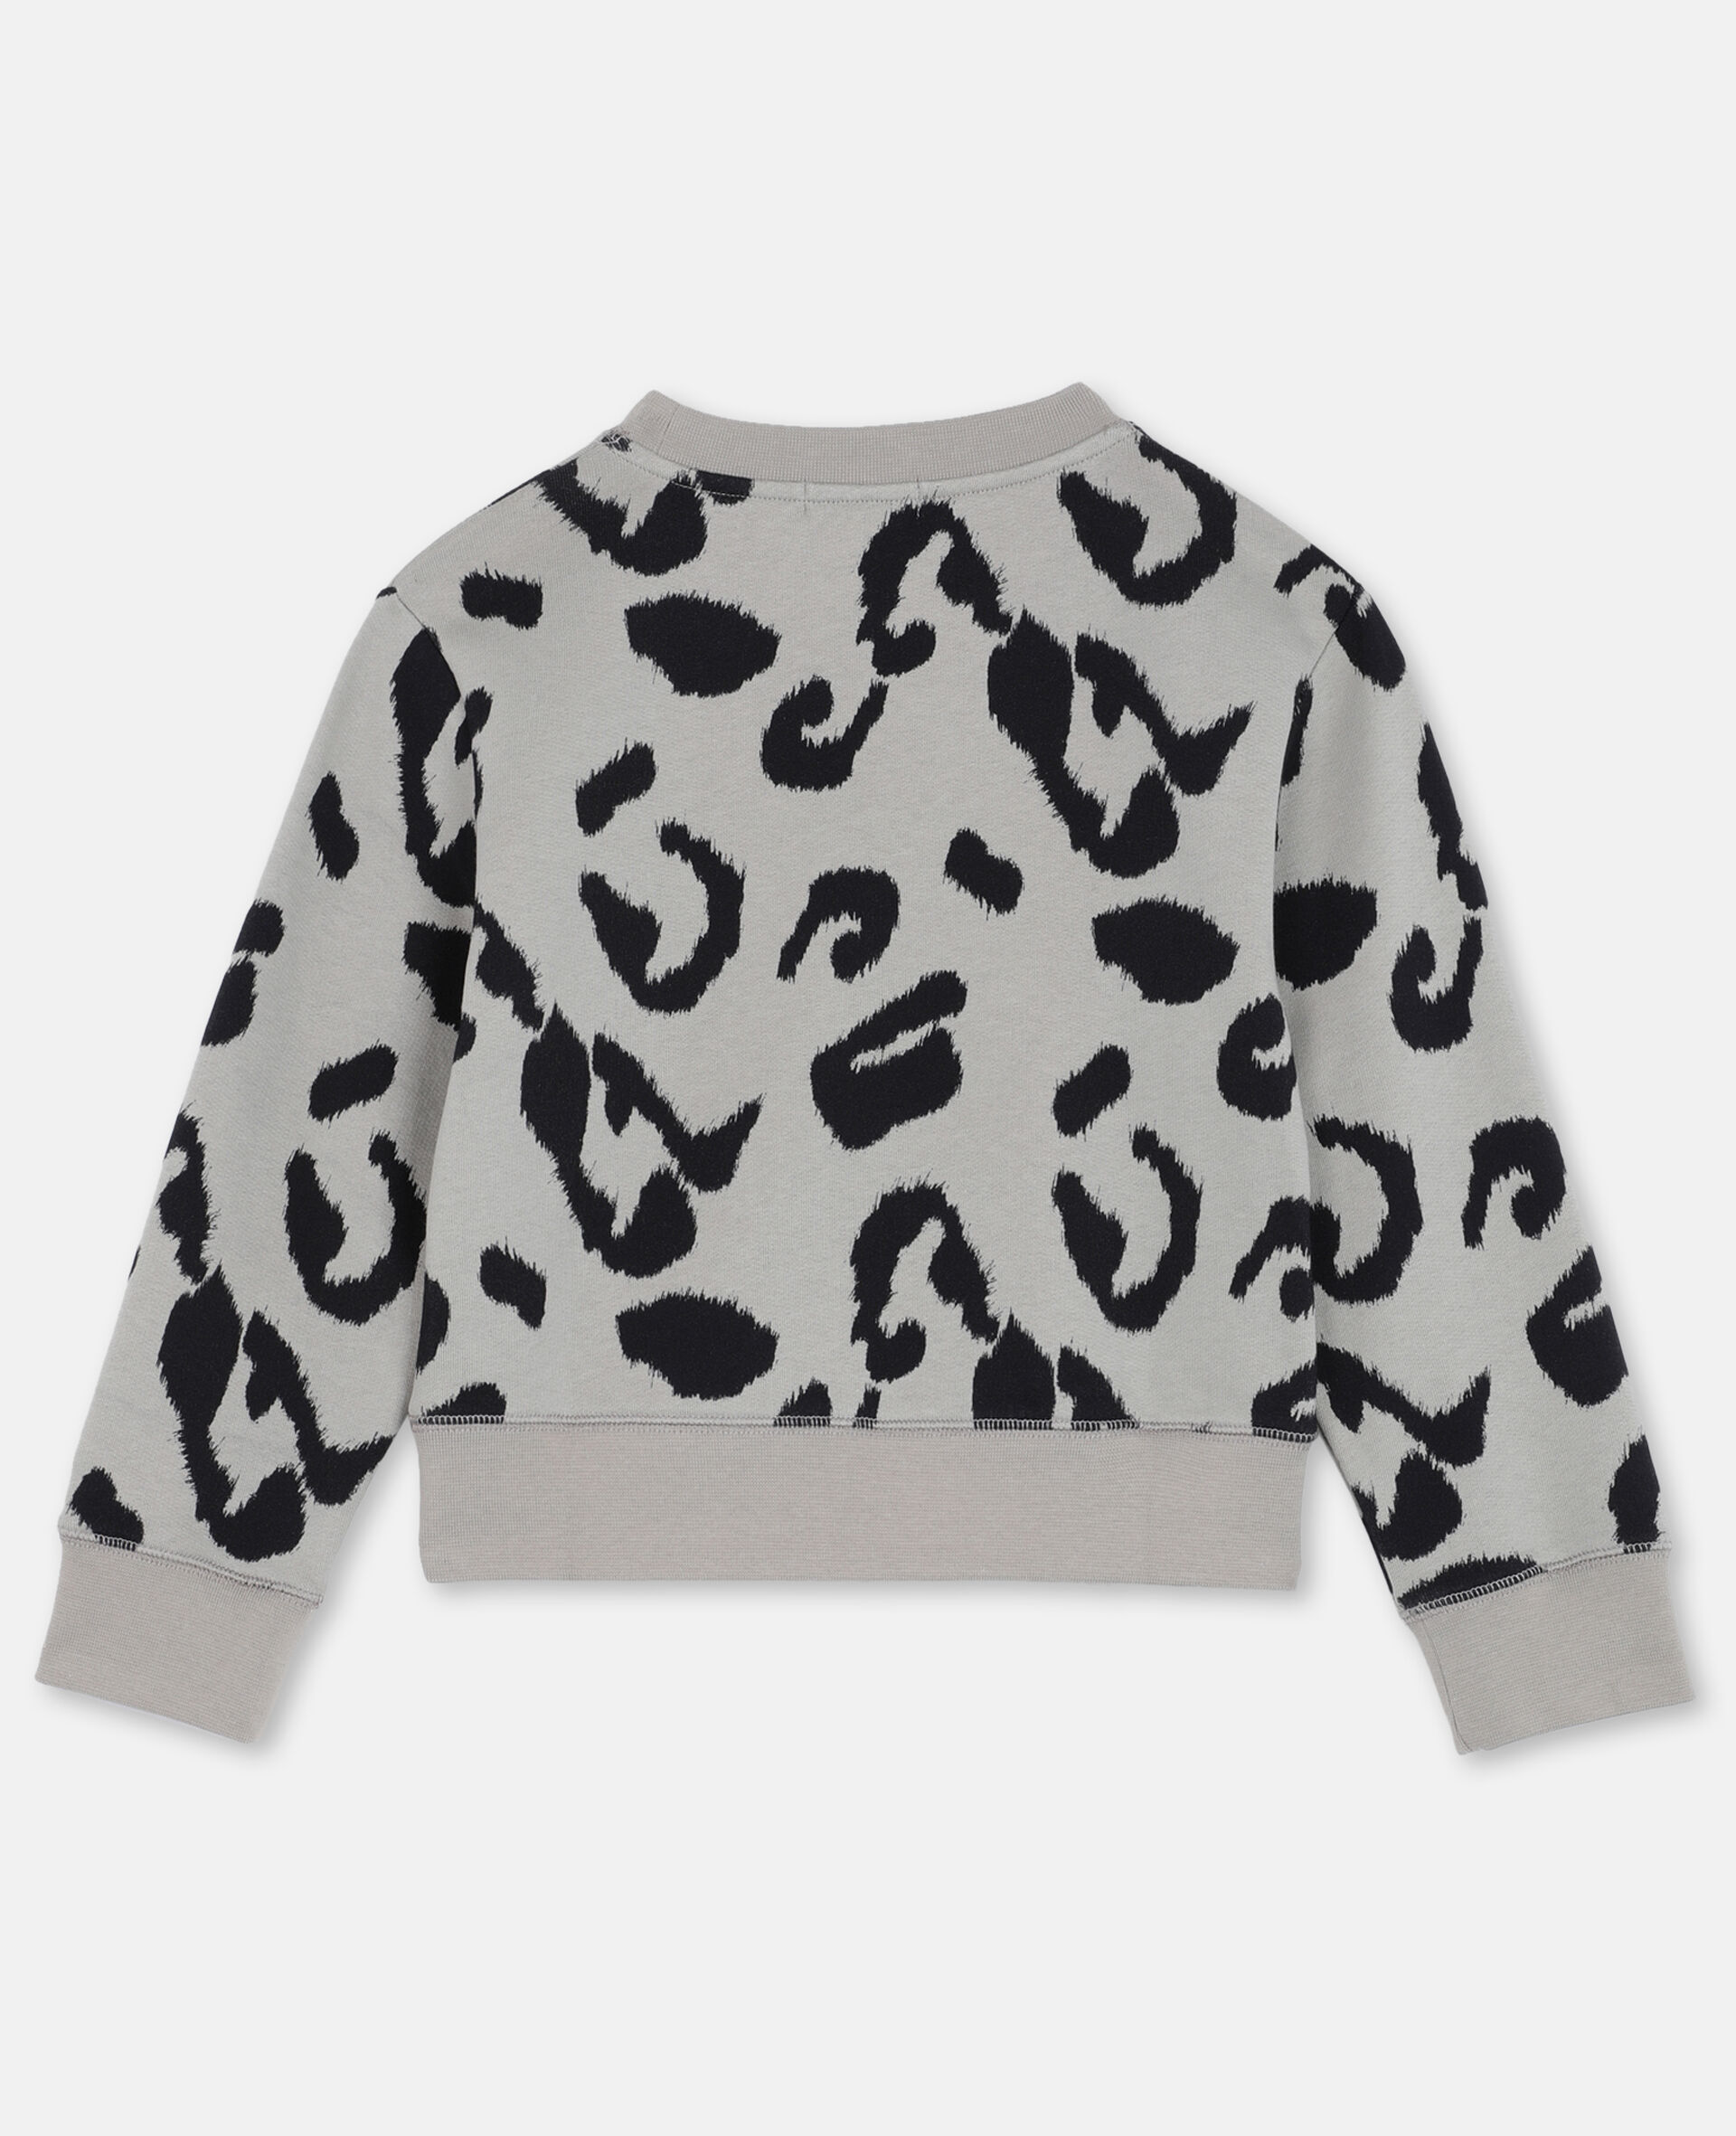 Leopard Cotton Fleece Sweatshirt -Multicolour-large image number 3